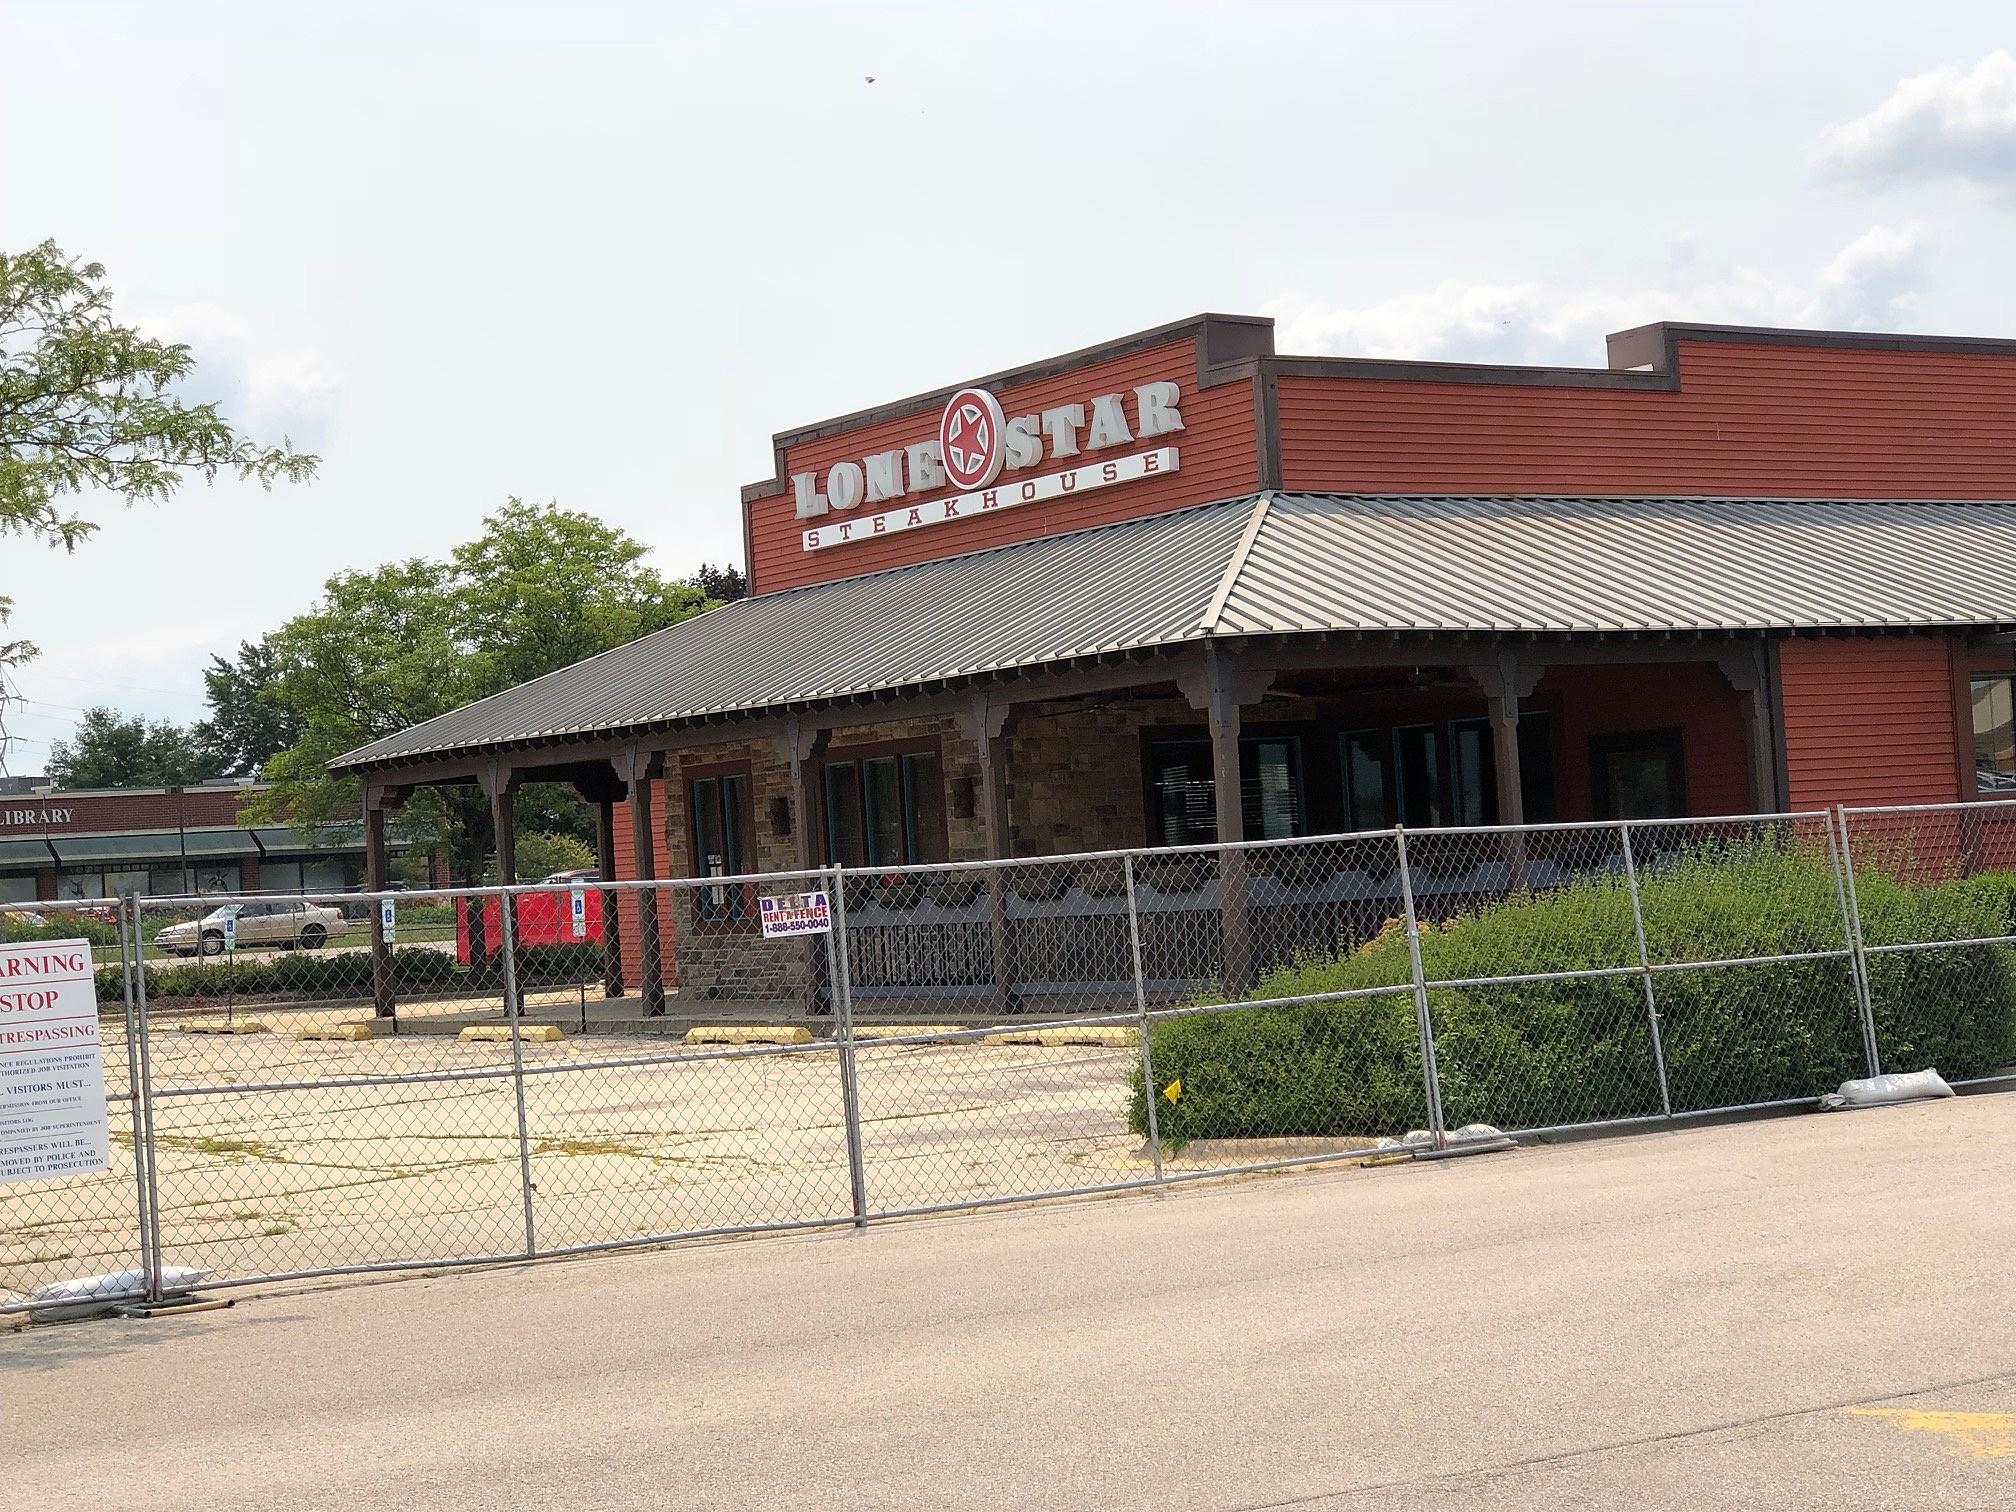 Vacant Rockford Lone Star Restaurant Mystery Solved